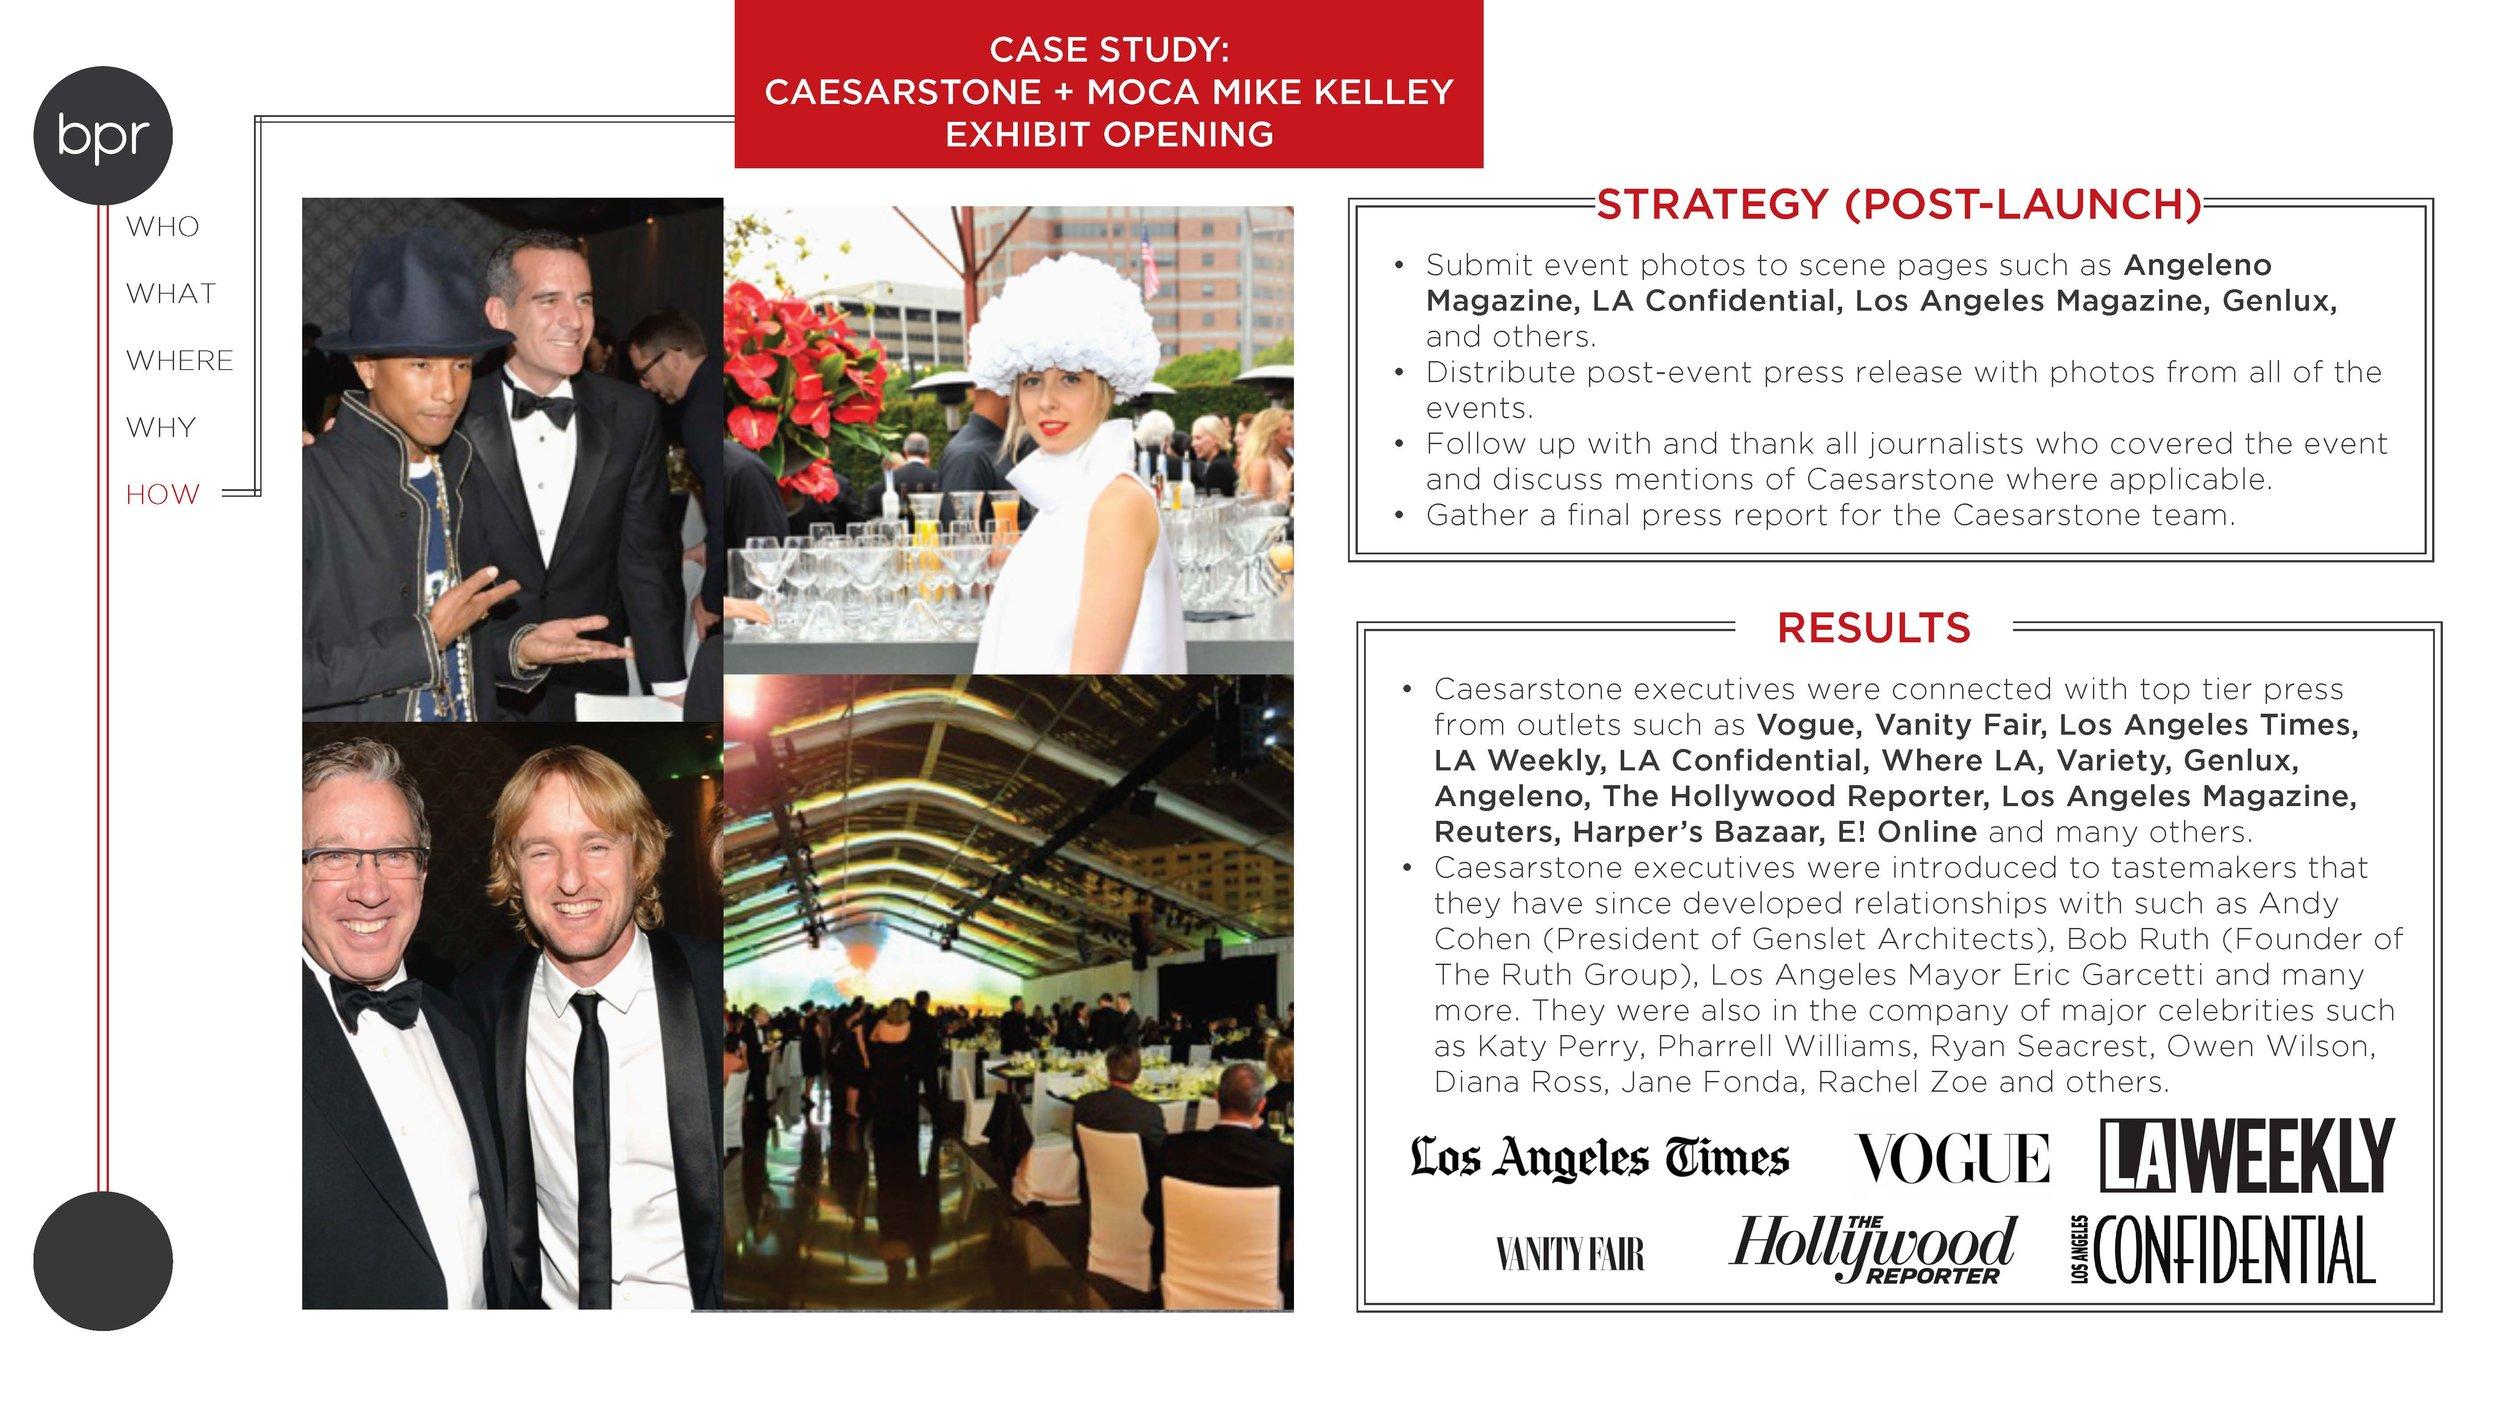 Caesarstone+MOCA Case Study_Page_3.jpg